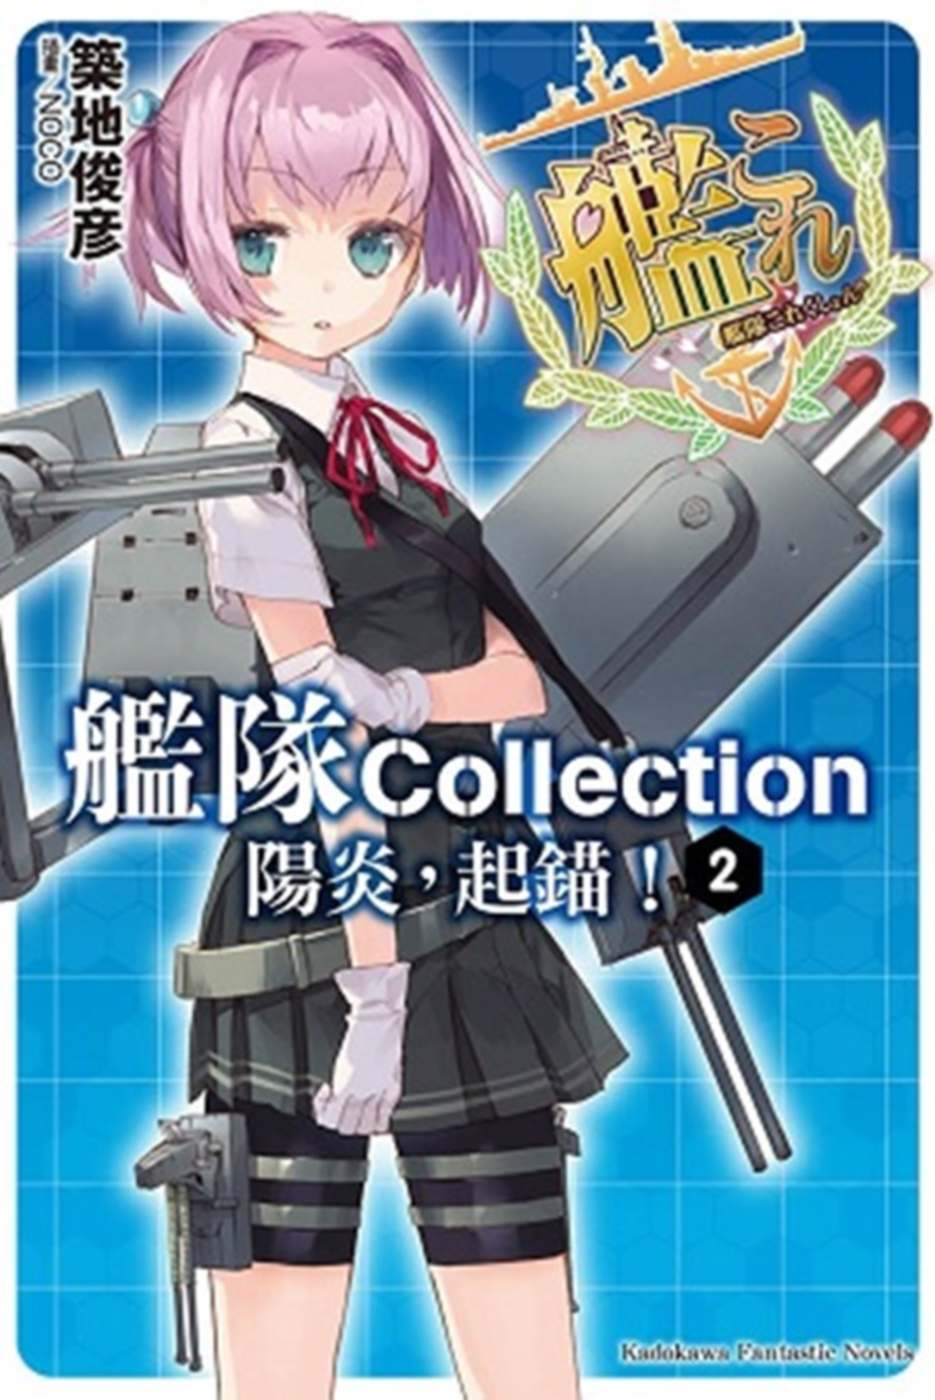 艦隊Collection 陽炎,起錨! 02